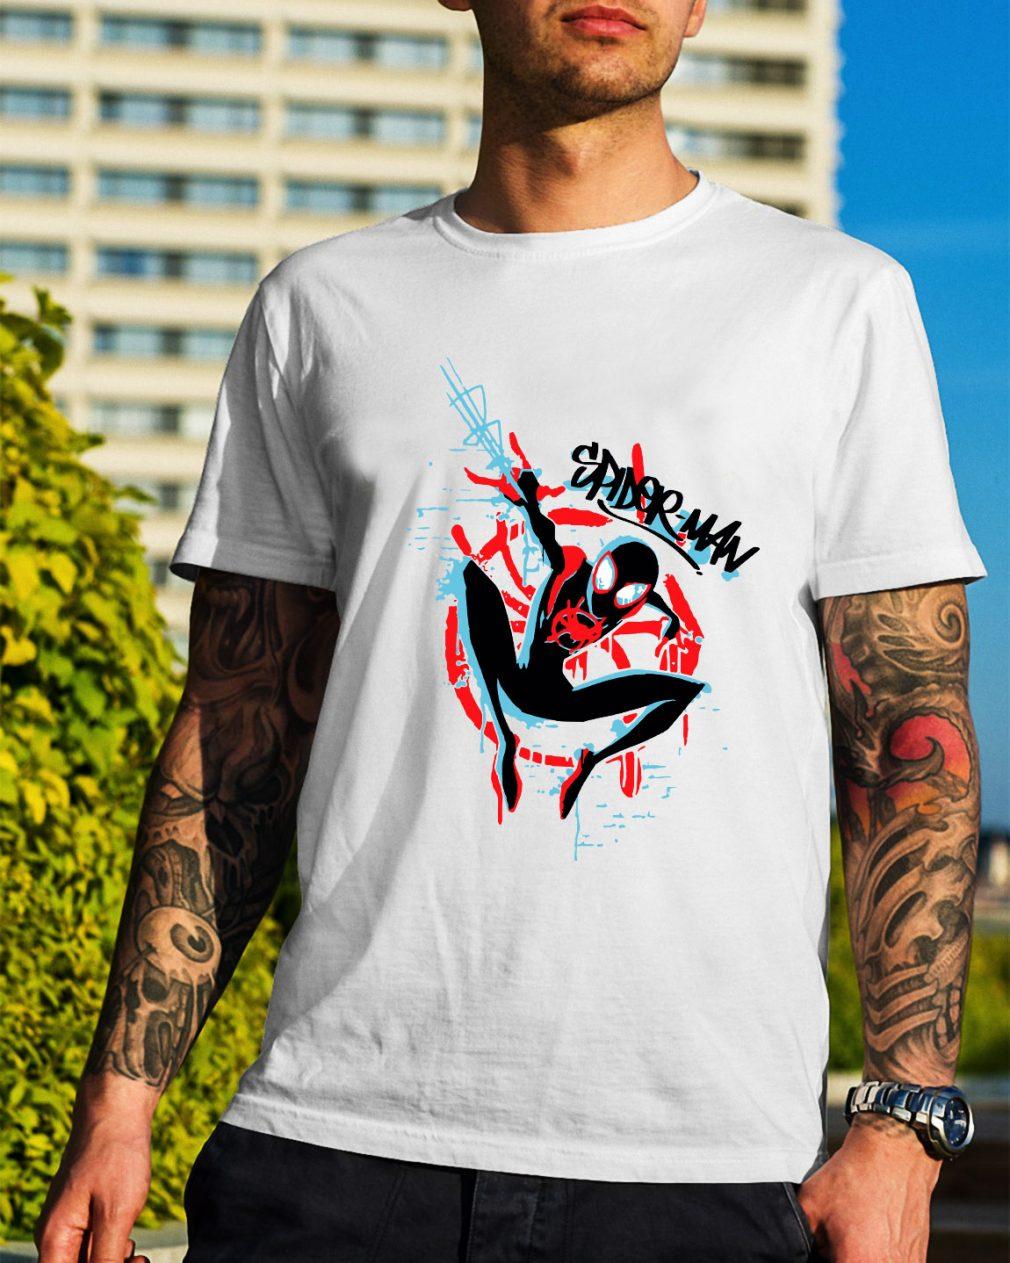 Signature Spider Man shirt